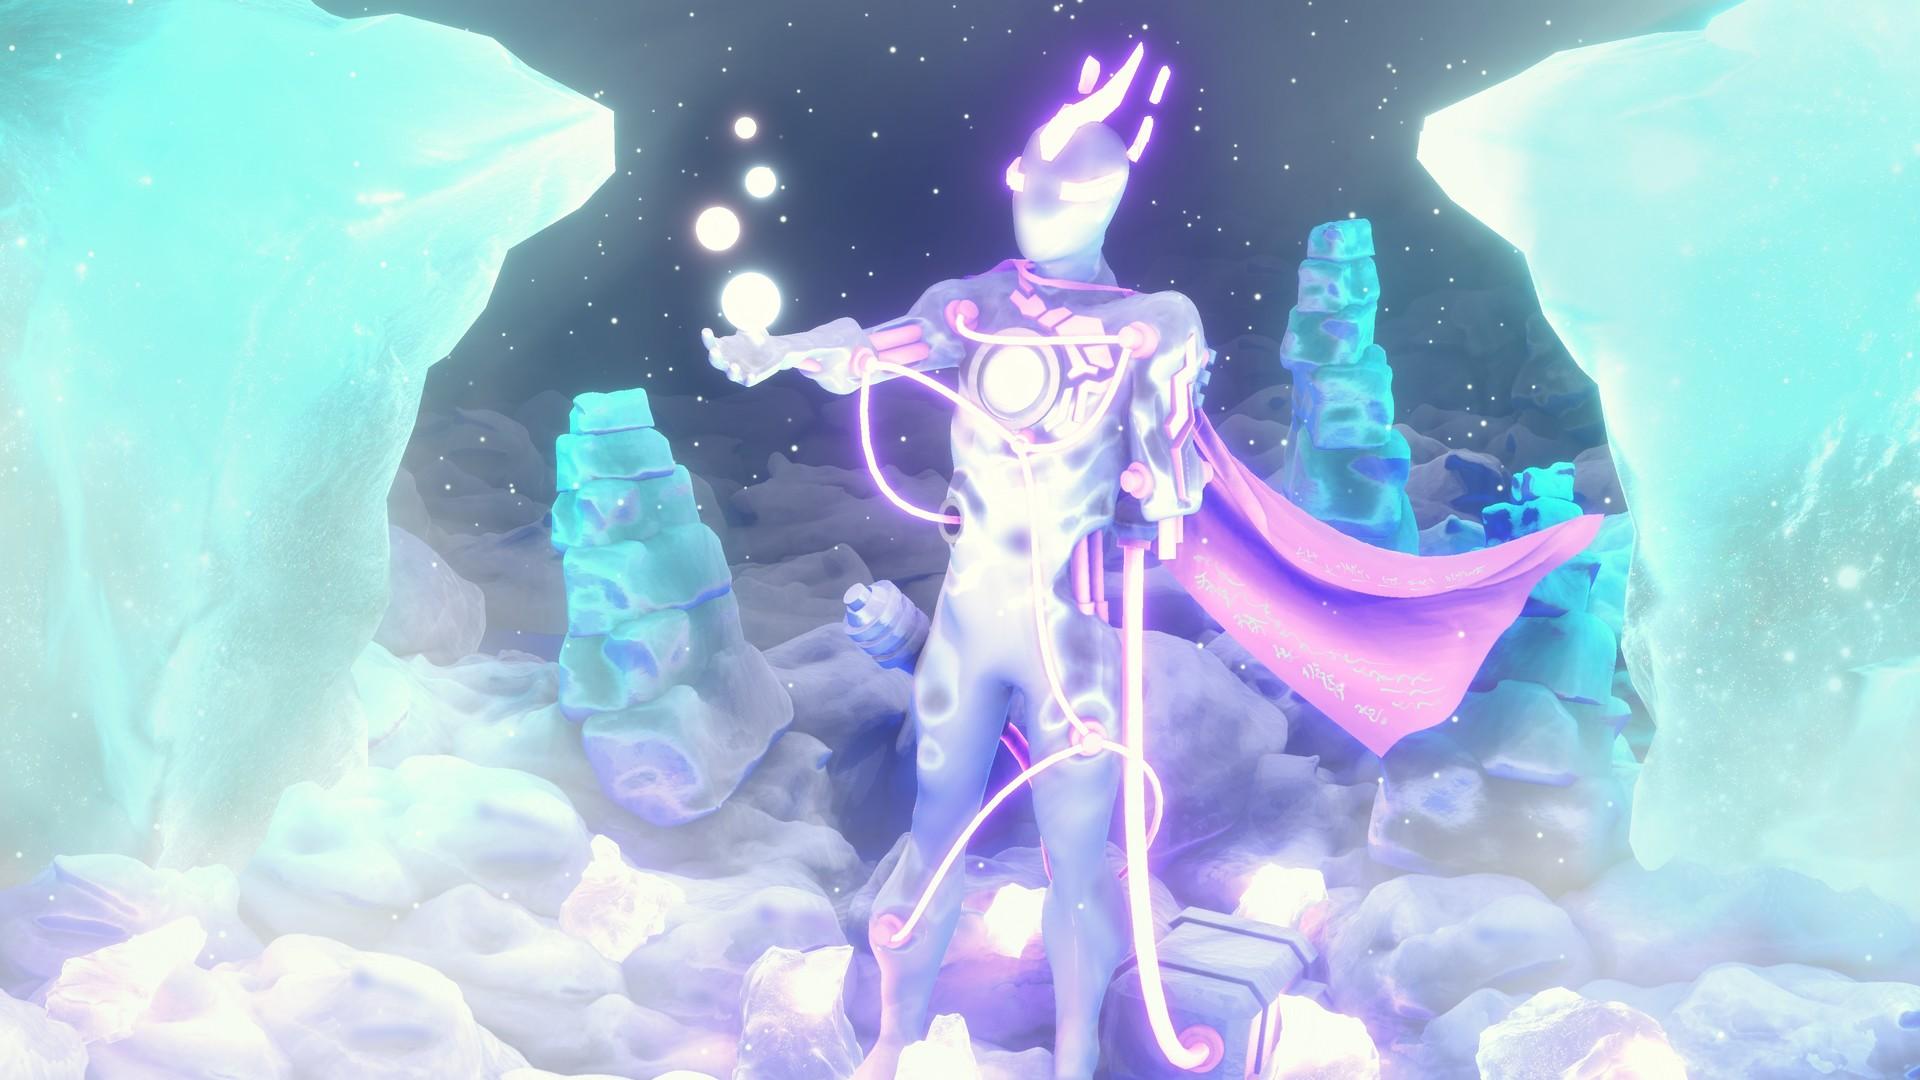 Snow Man! The all-new winter superhero.